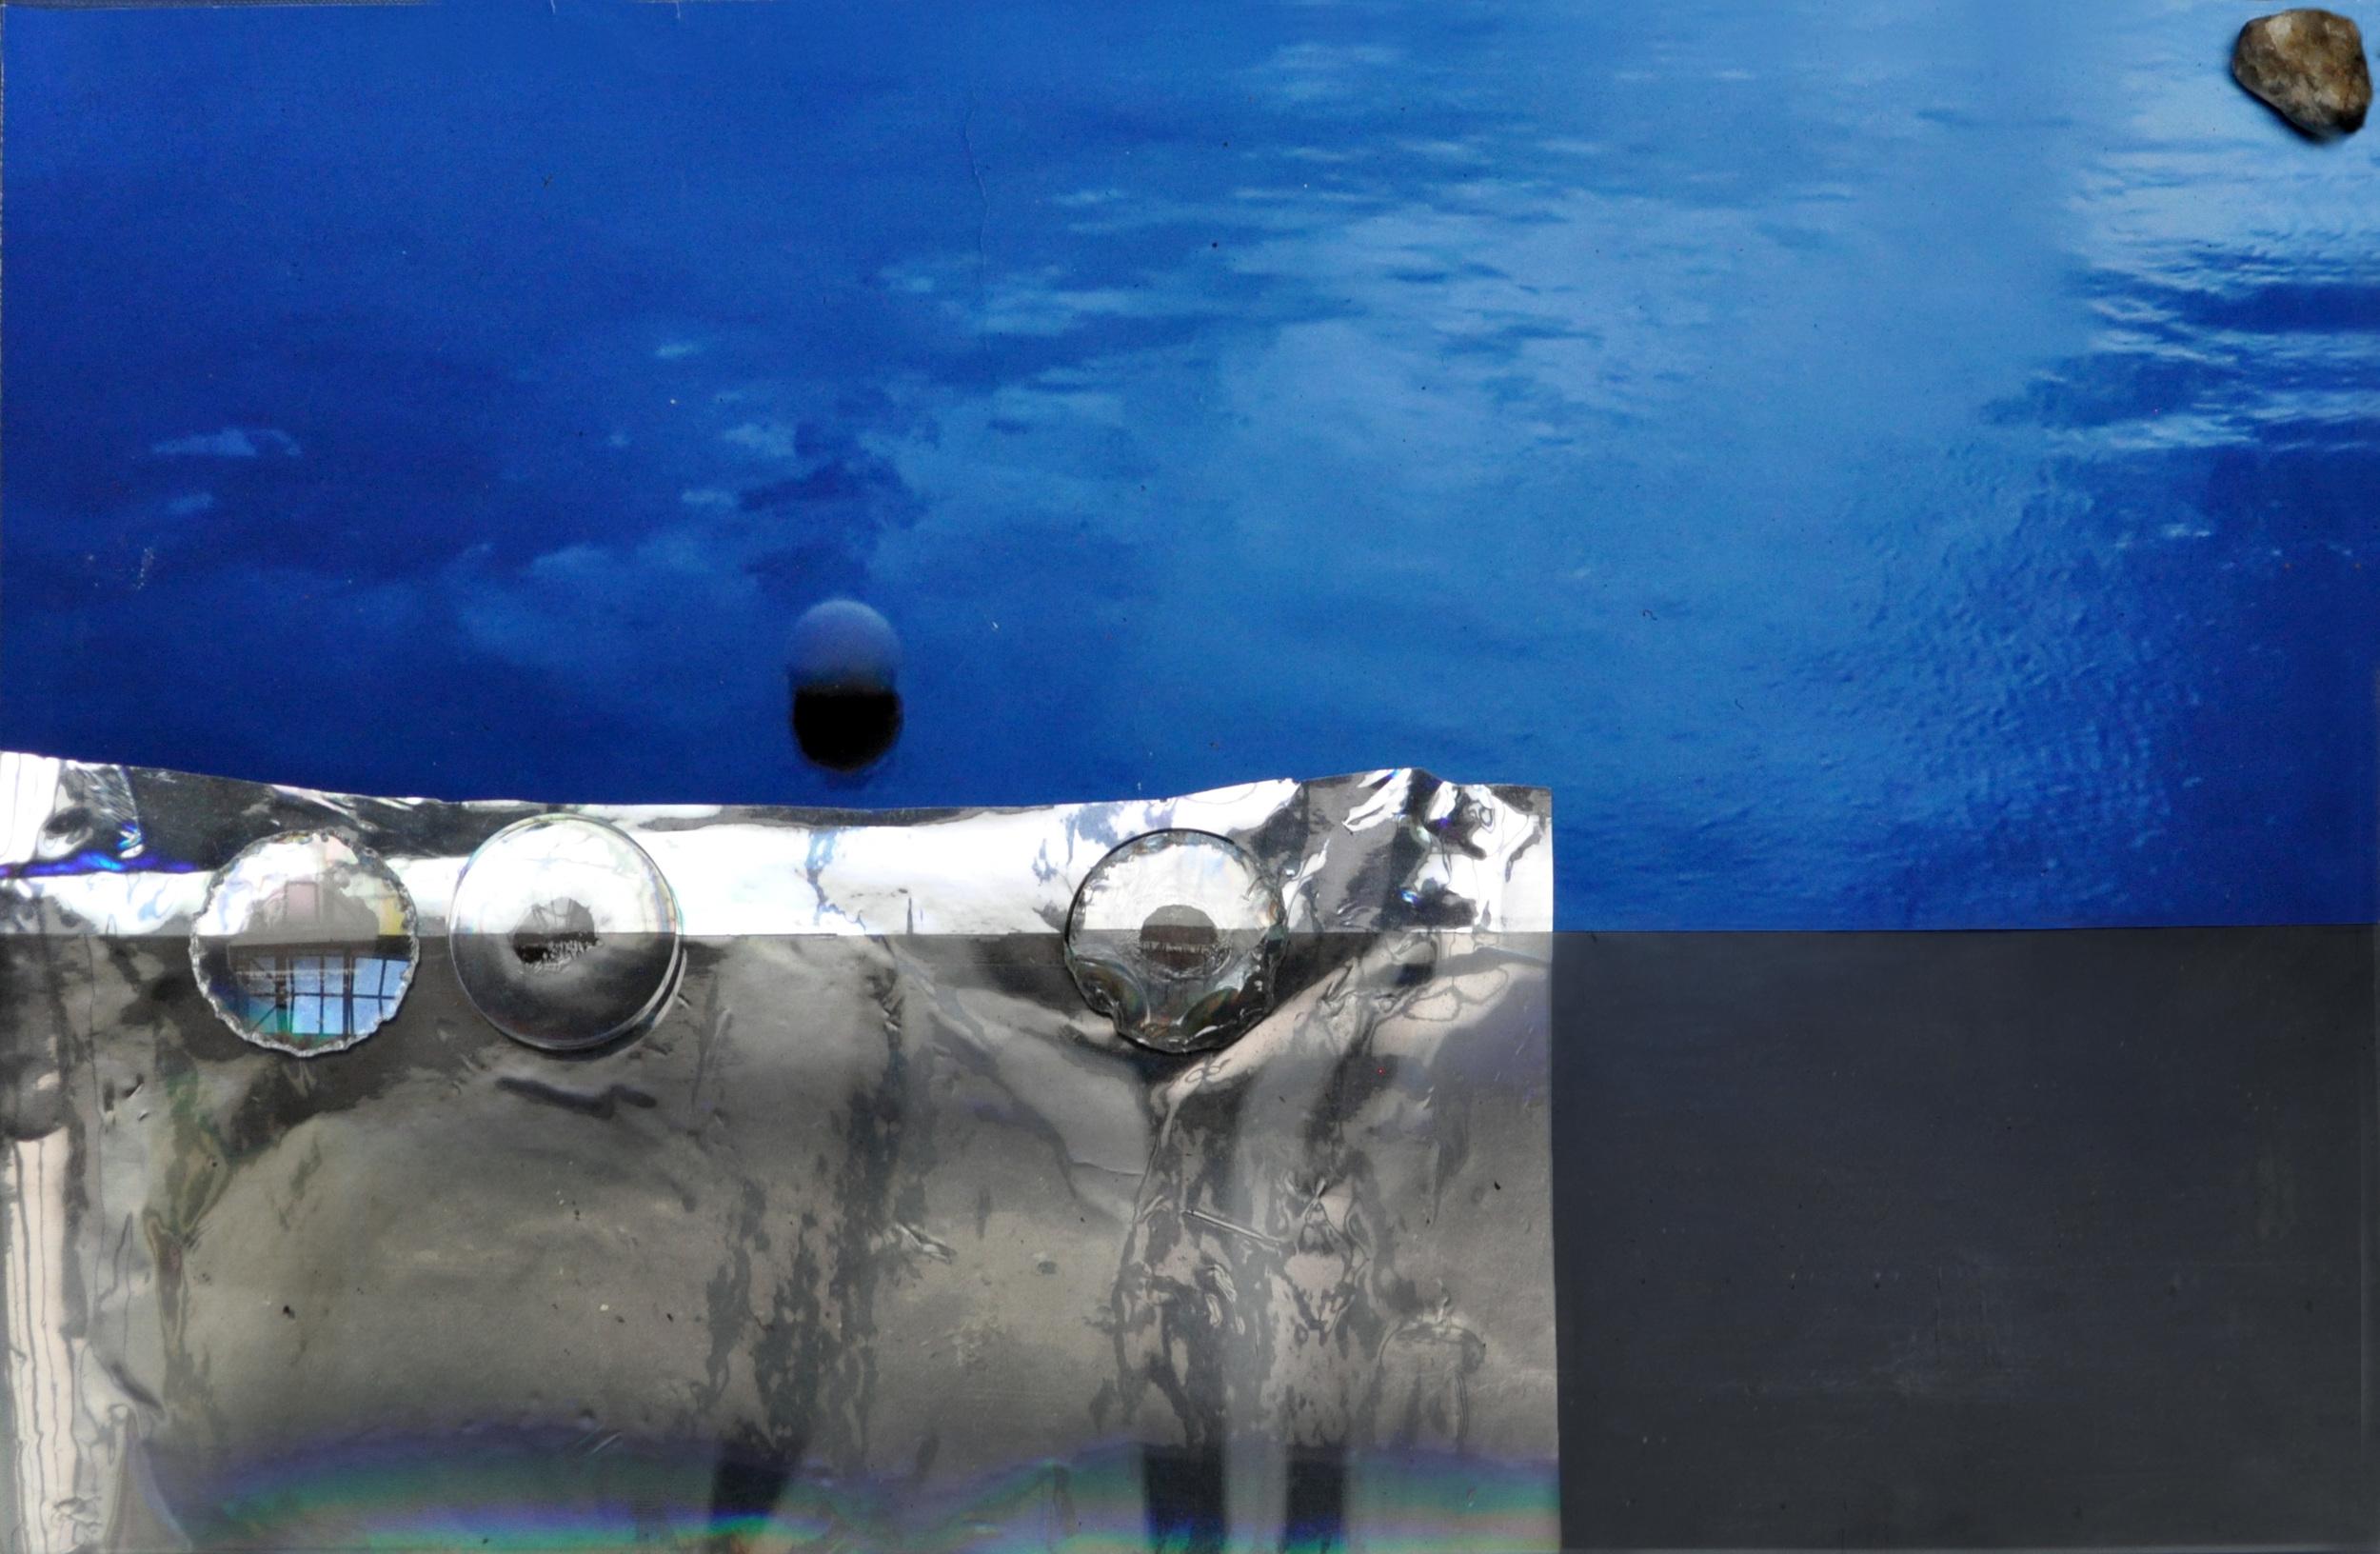 Seabed Diorama , 2016 diorama, c-print, vynil, mylar, optical lenses, stone 45 x 61 cm